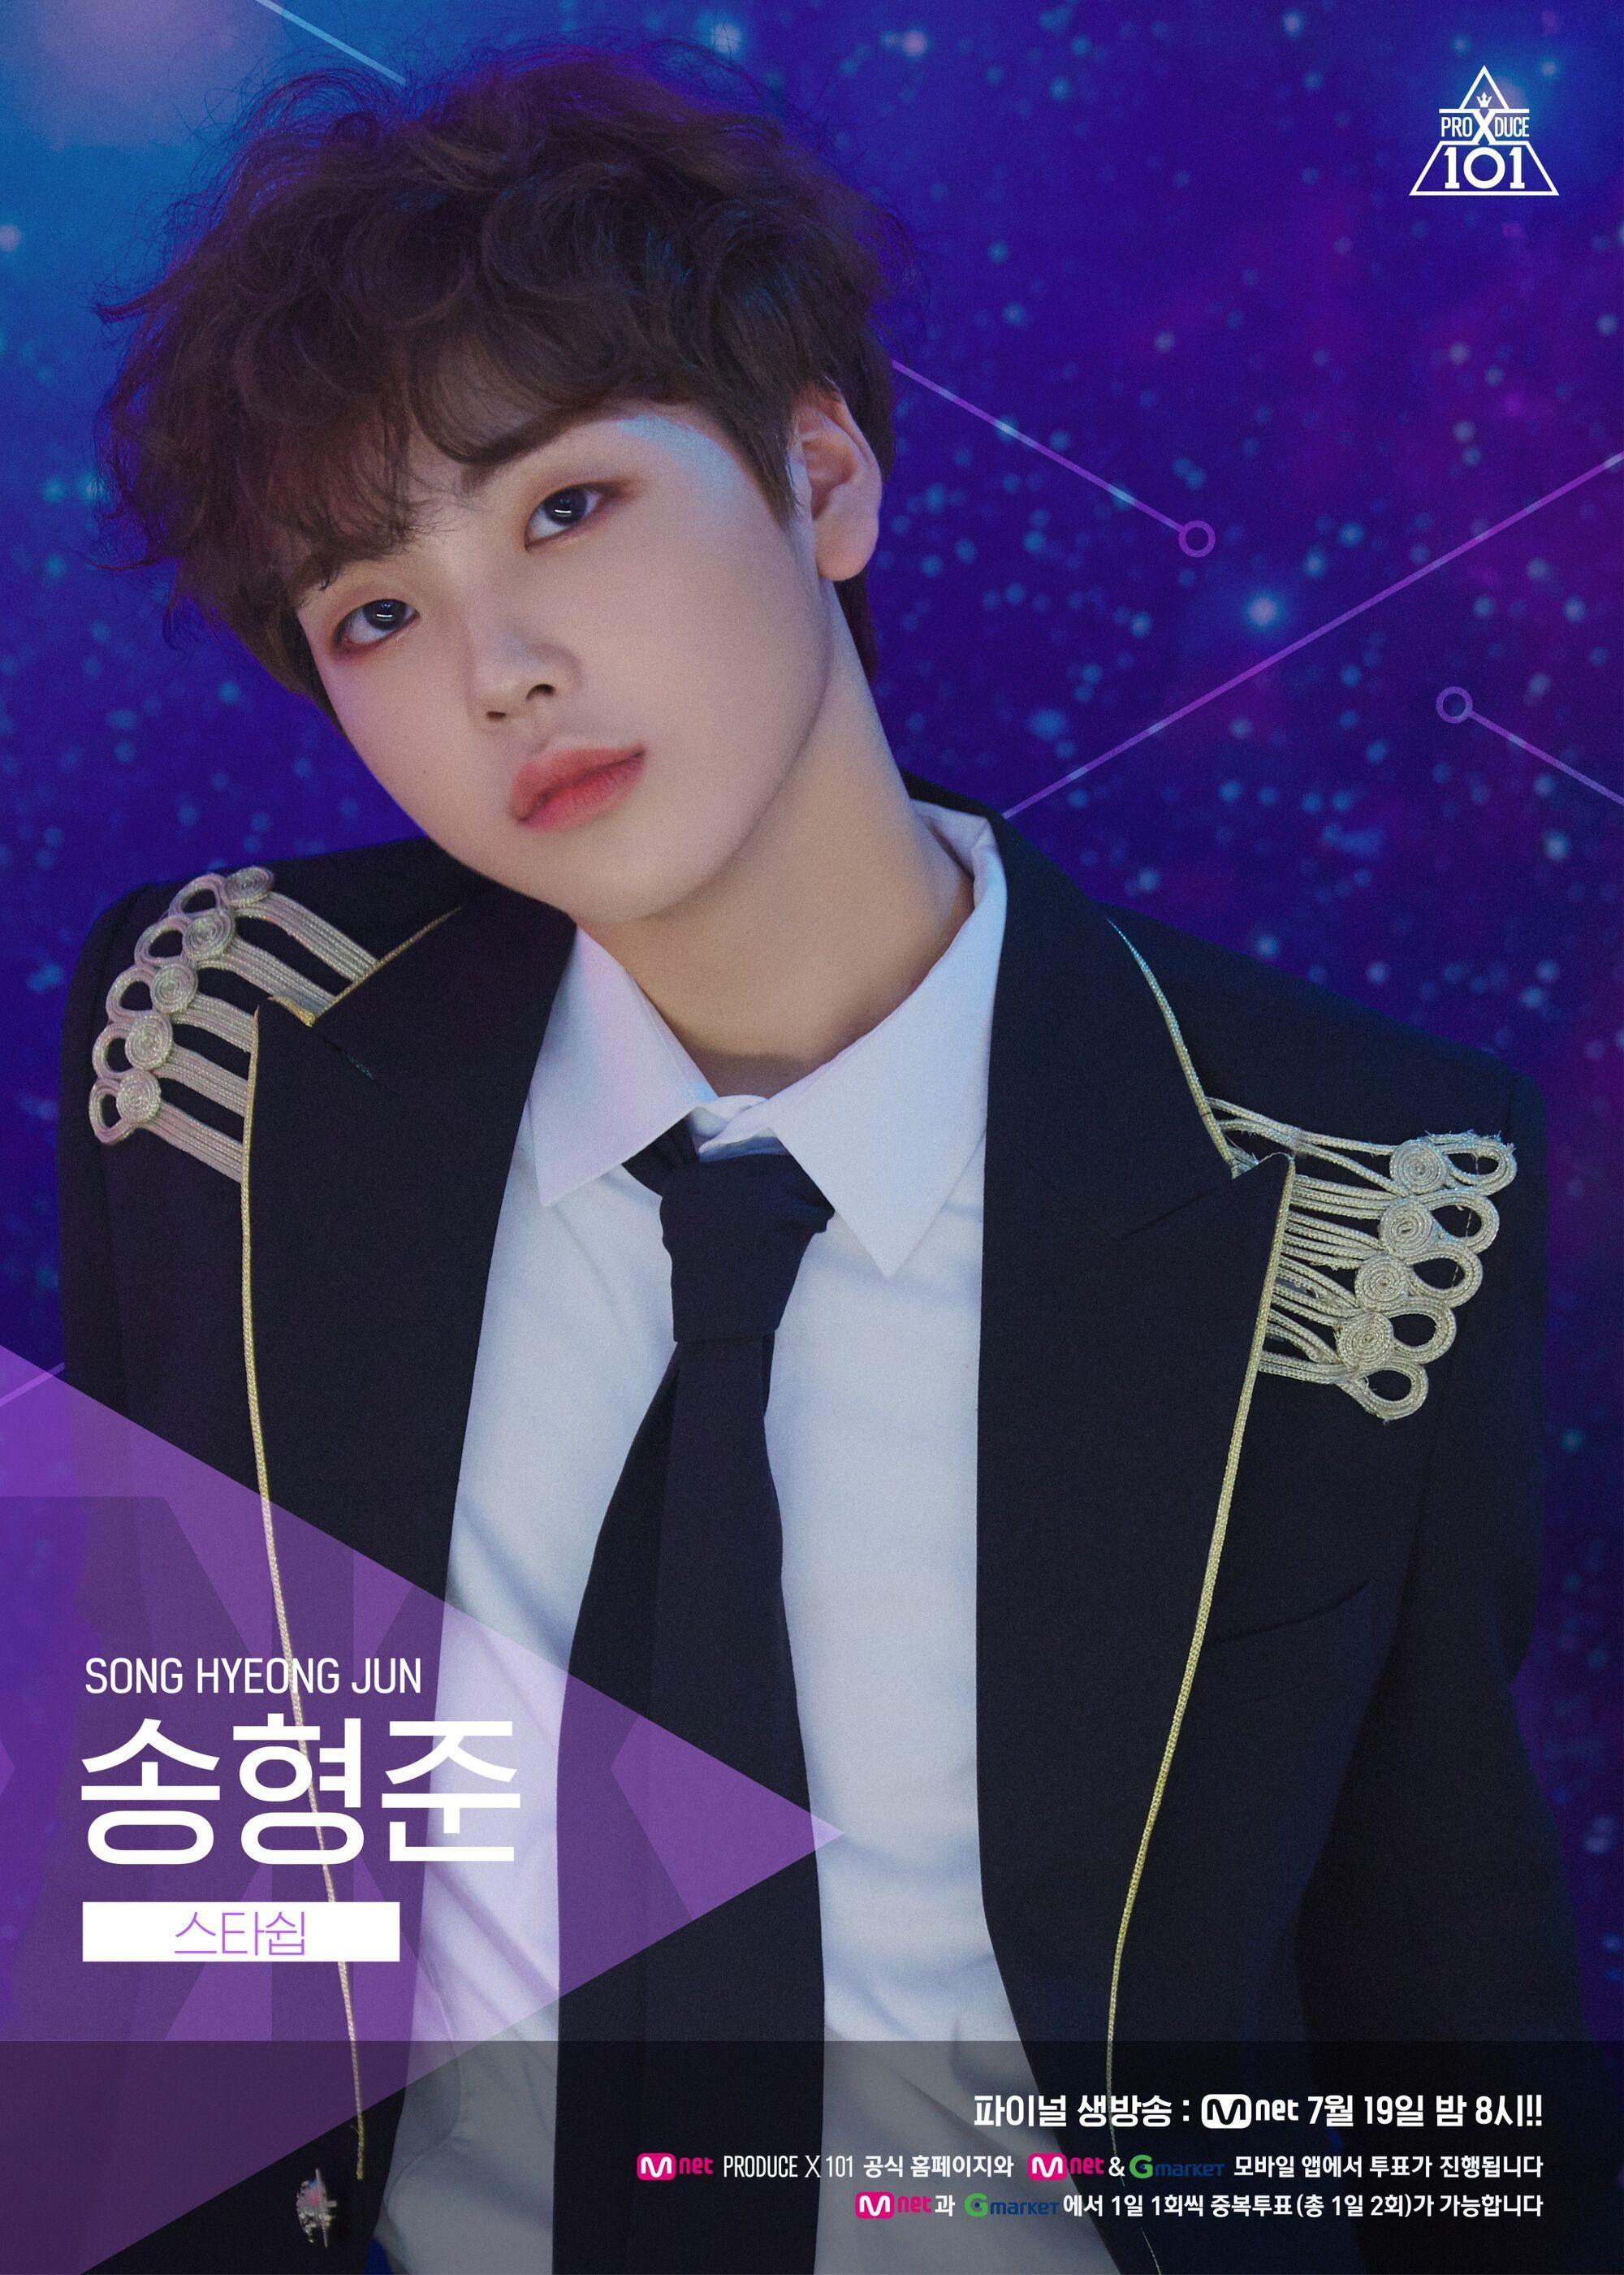 Song Hyeongjun | Produce 101 Wikia | FANDOM powered by Wikia